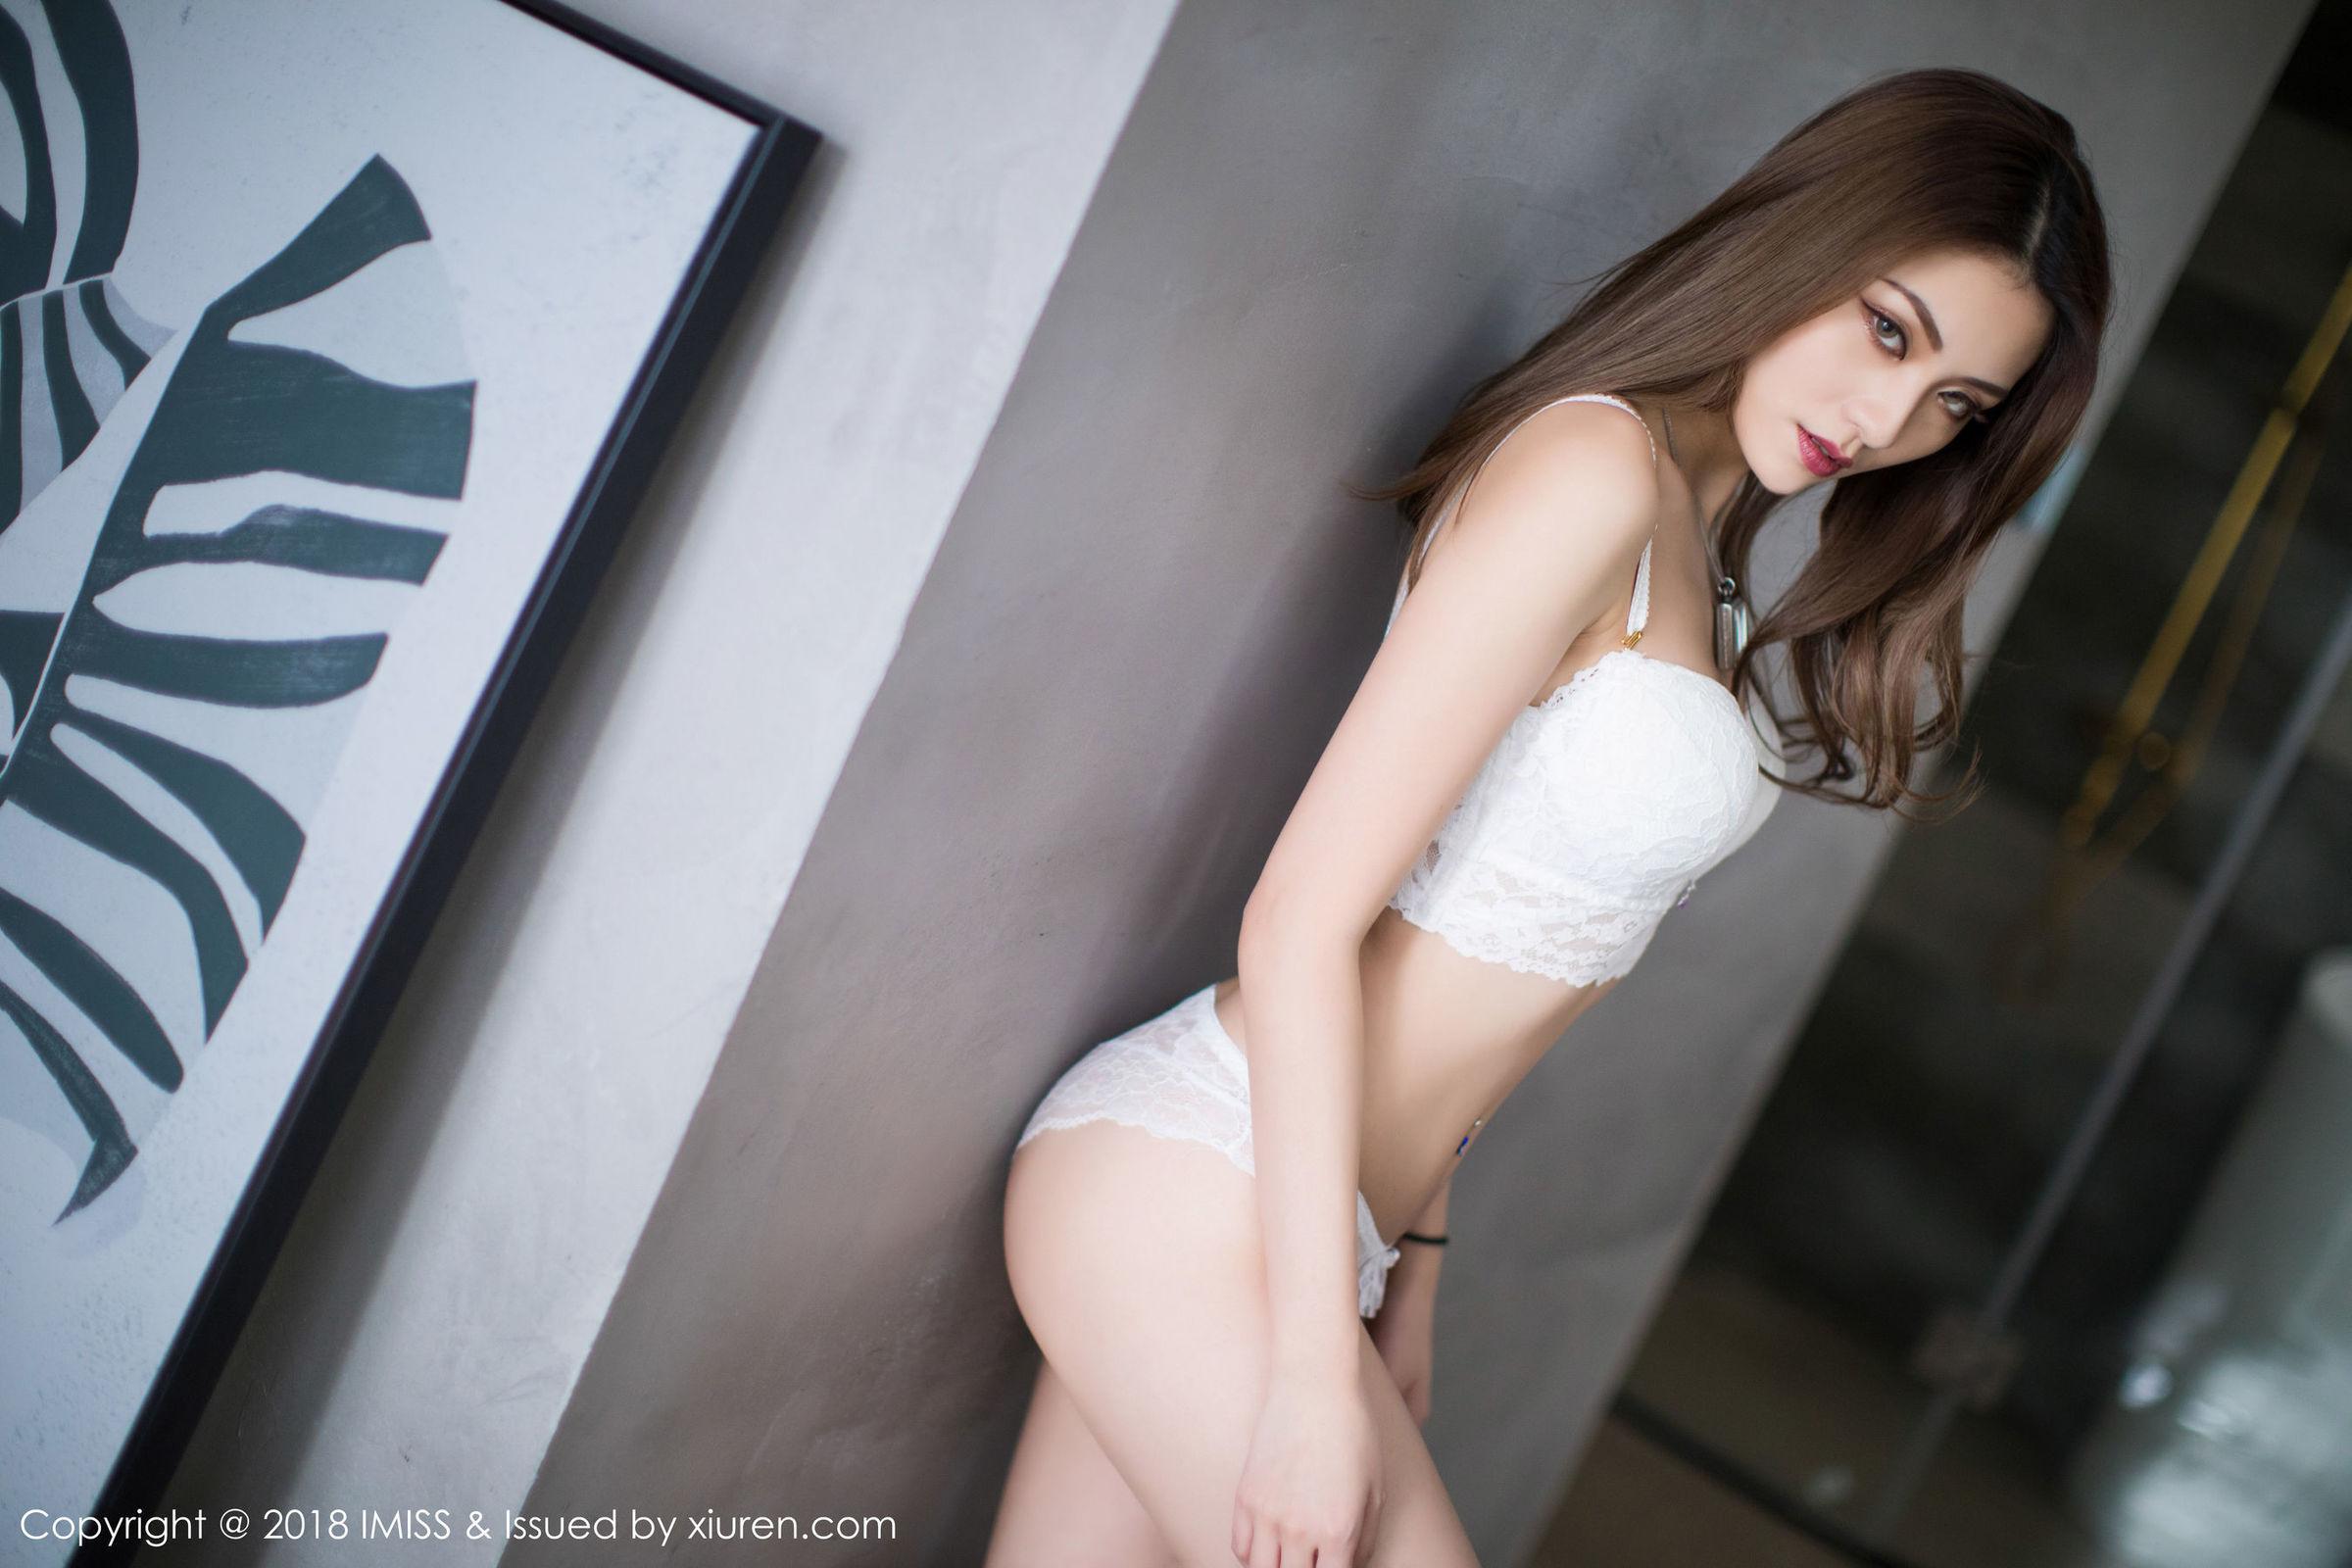 GVG-670超薄黑丝袜美女严冰冰女仆装短裙露底美腿诱惑写真